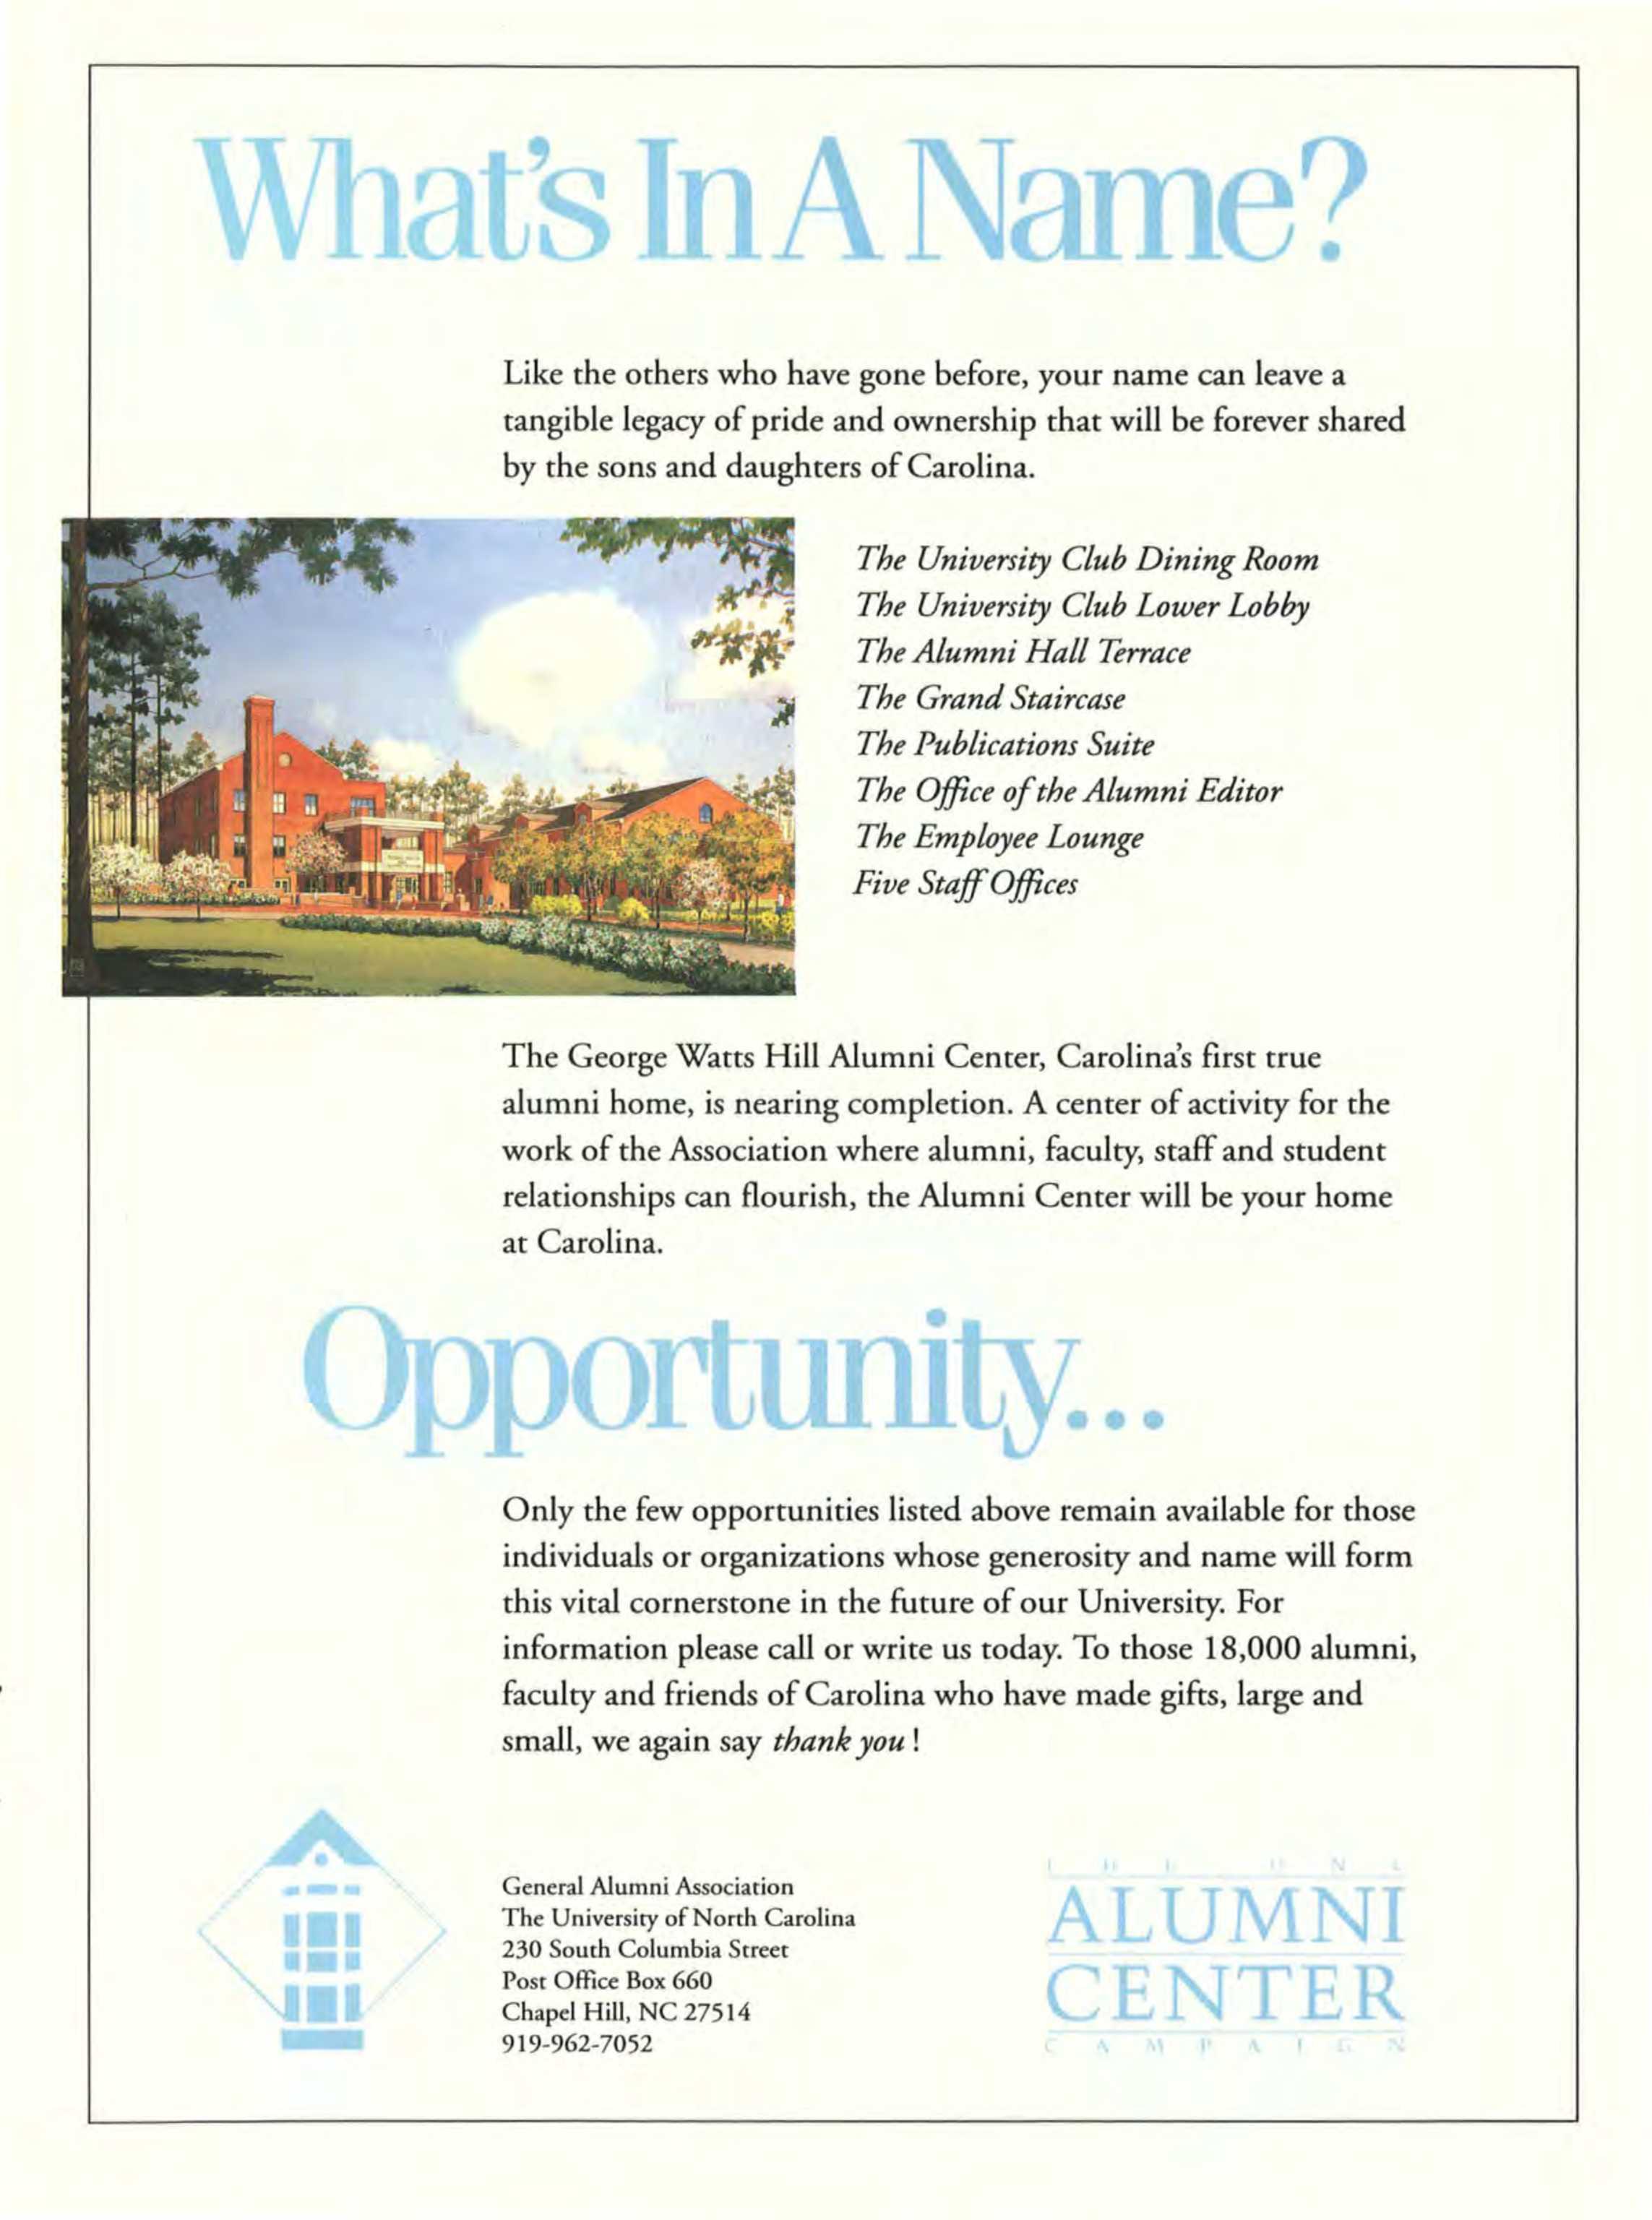 Carolina Alumni Review - Summer 1986 - page C3